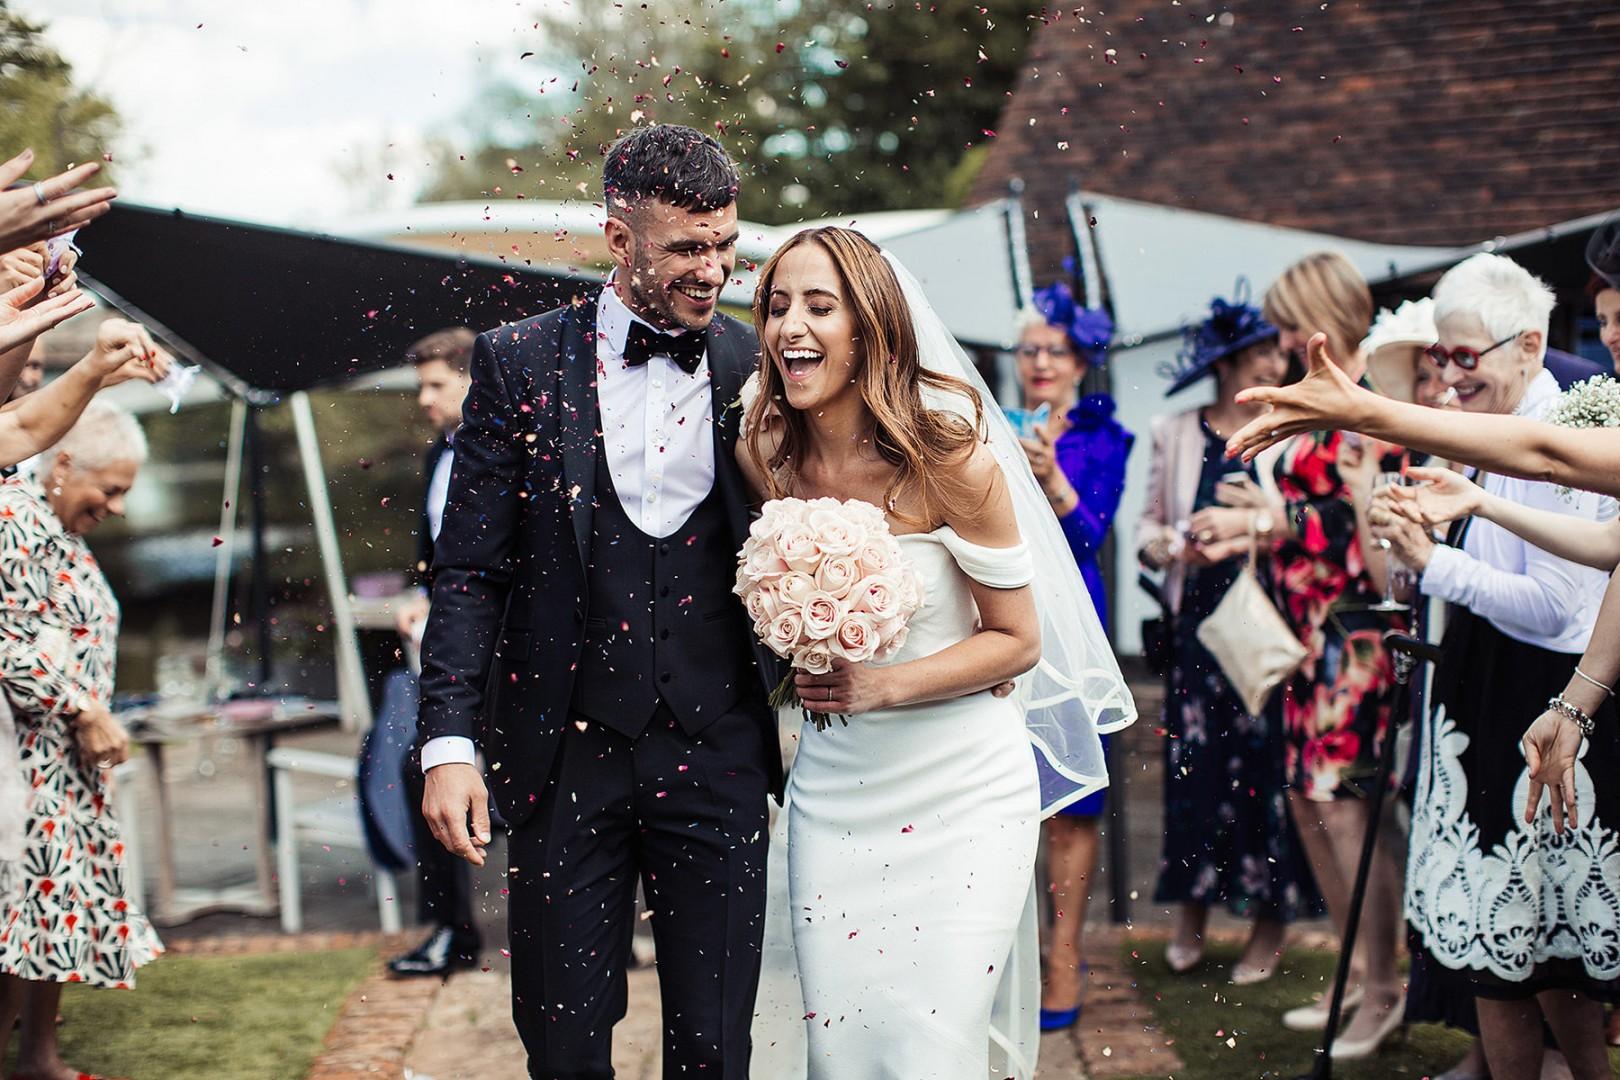 Milsom Weddings, Spring Open Days in Essex and Suffolk 2021